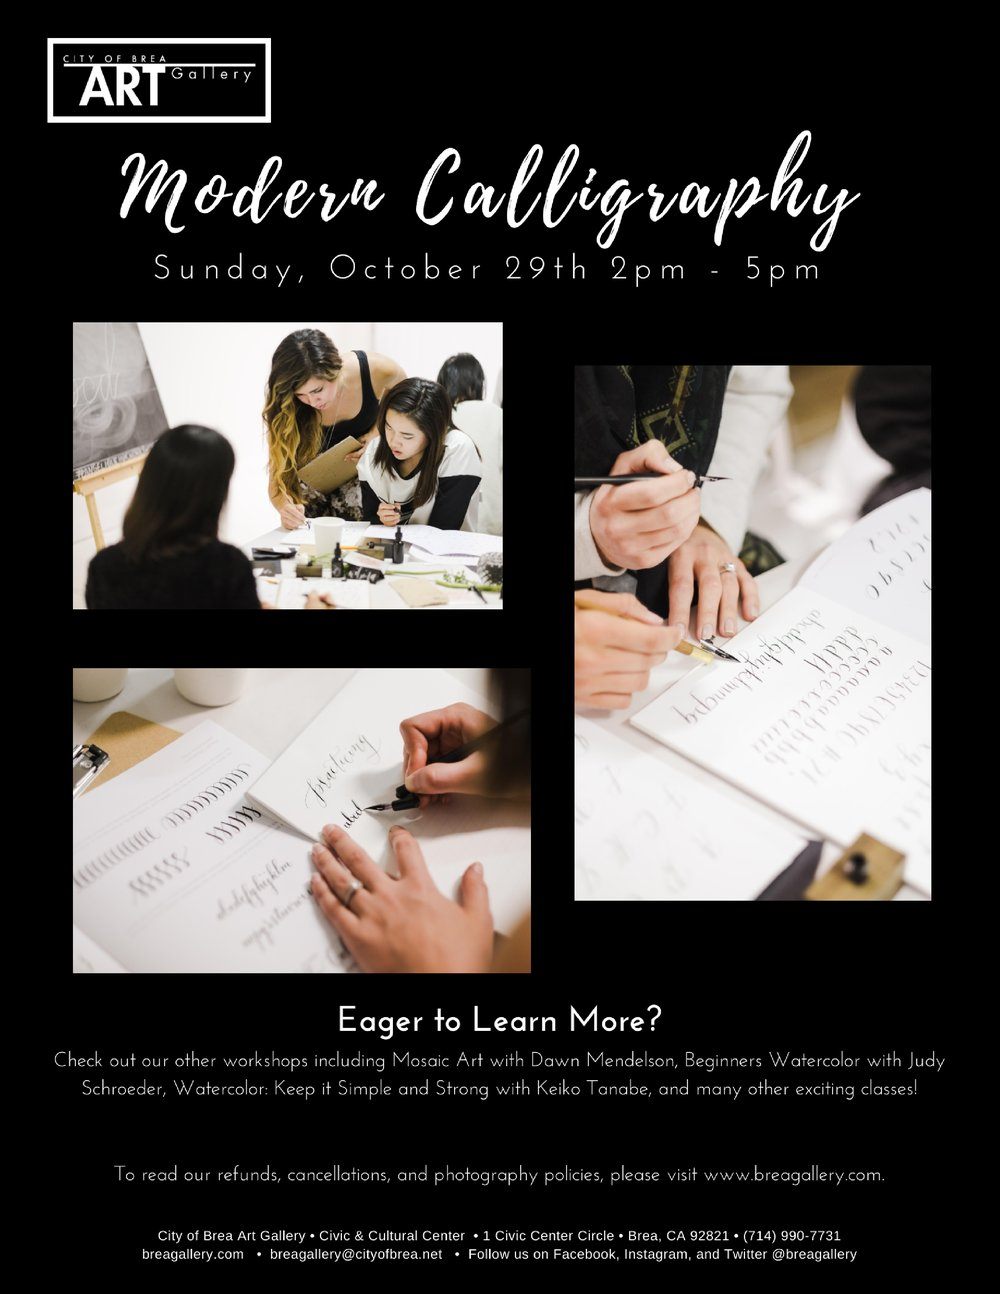 Modern Calligraphy Flyer #2 (3).jpg